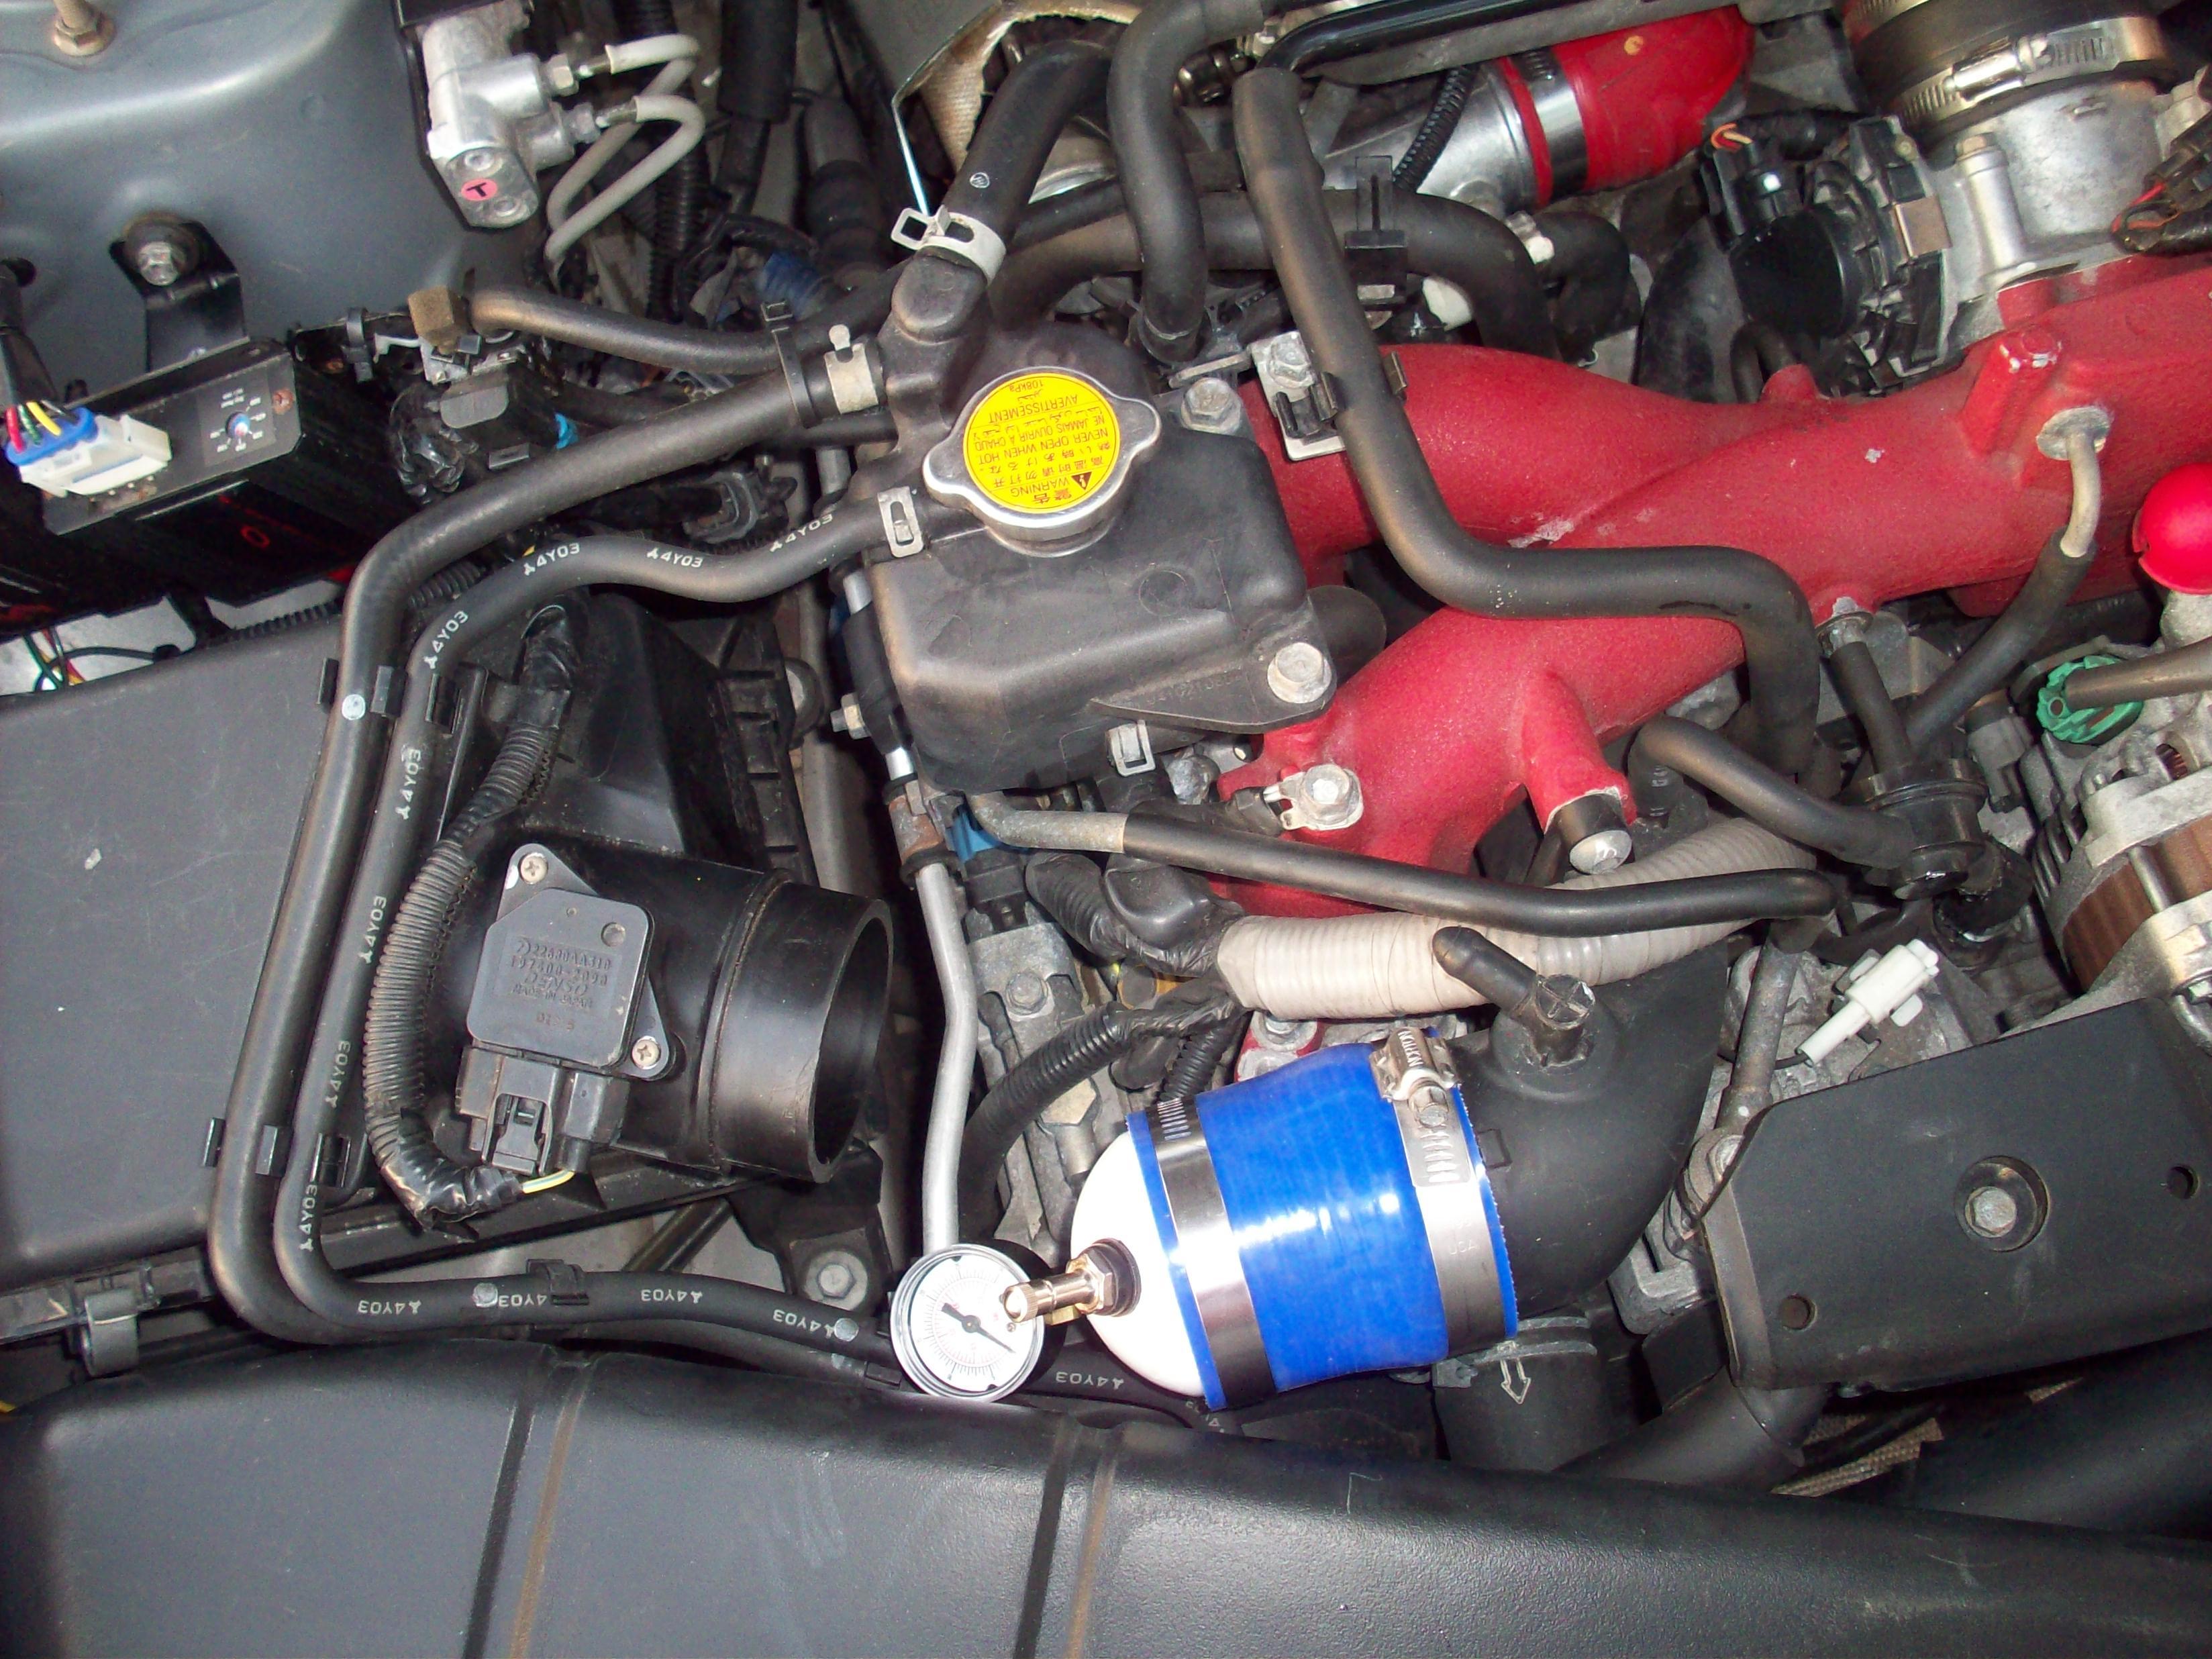 subaru2?t=1422674539 how to boostleak test a subaru Subaru Firing Order Diagram at n-0.co